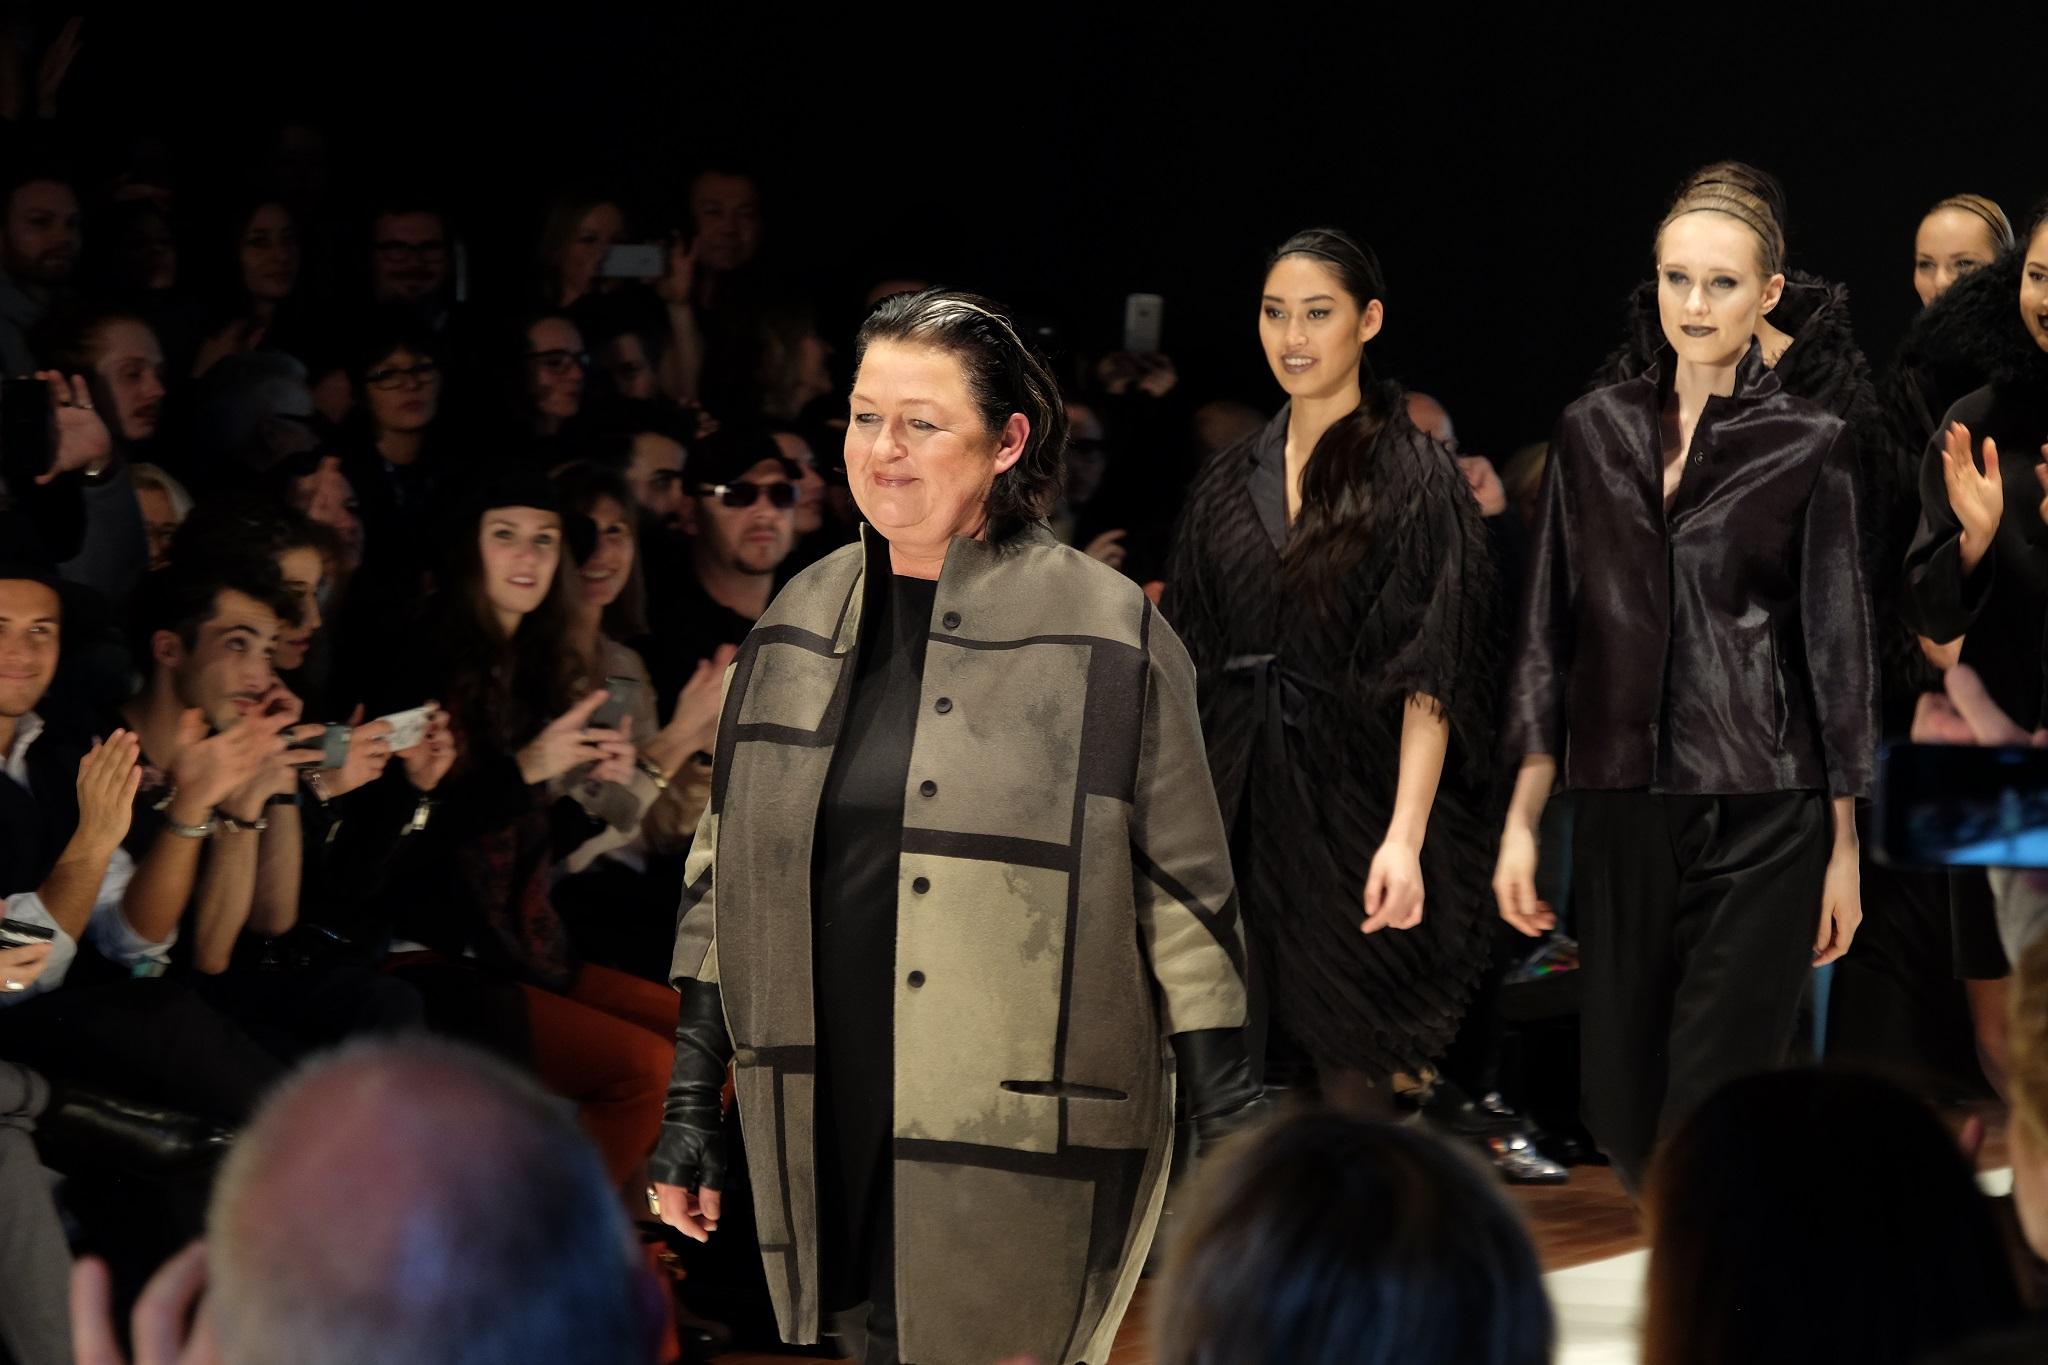 Annette Görtz, Annette Görtz Fashionshow 2016, Modeblog Lieblingsstil, Fashionblog Lieblingsstil, Fashionblogger Lieblingsstil